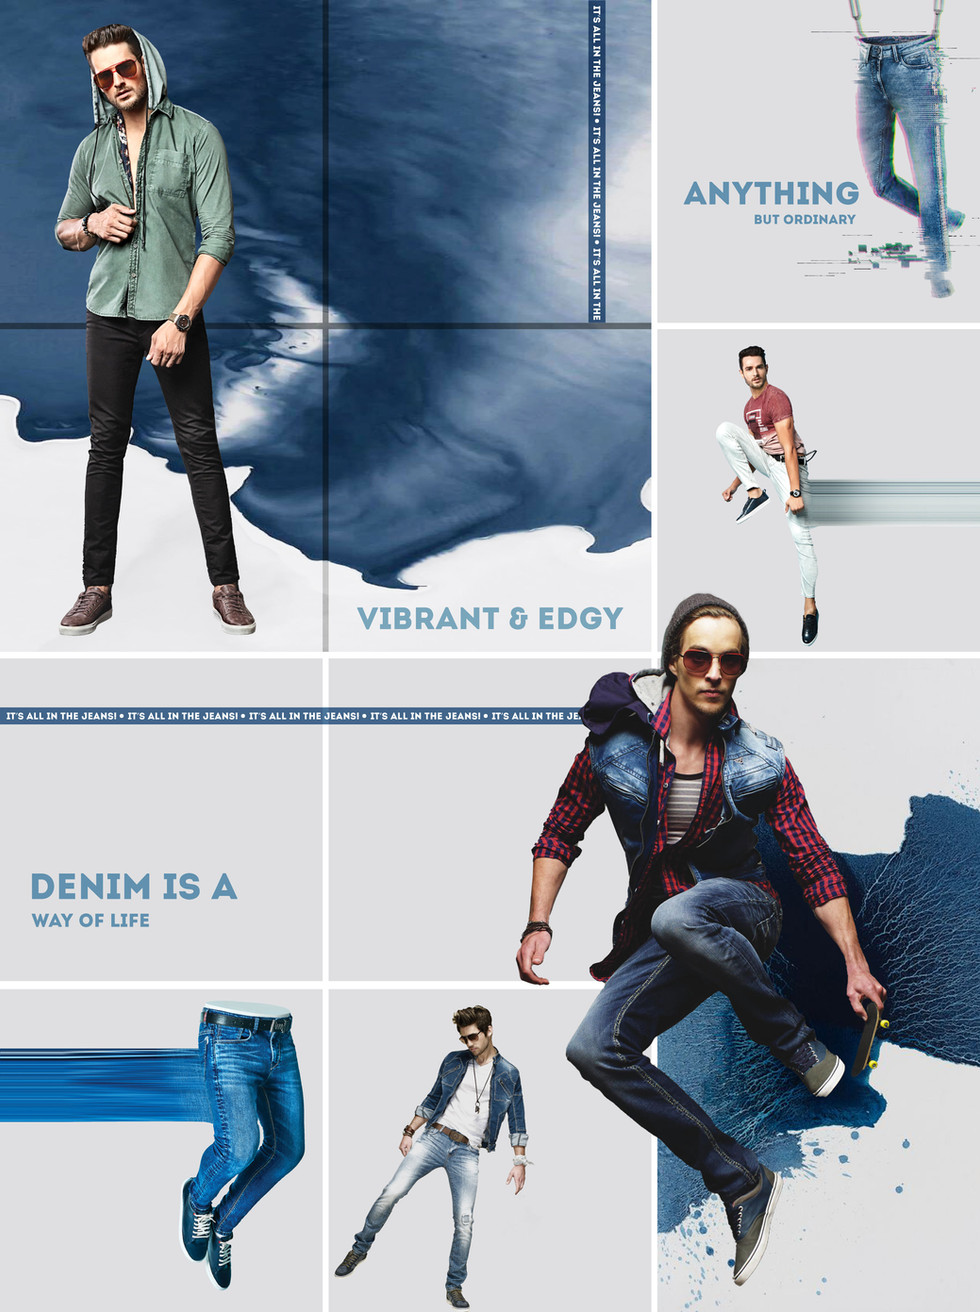 Lawman-jeans-grid.jpg